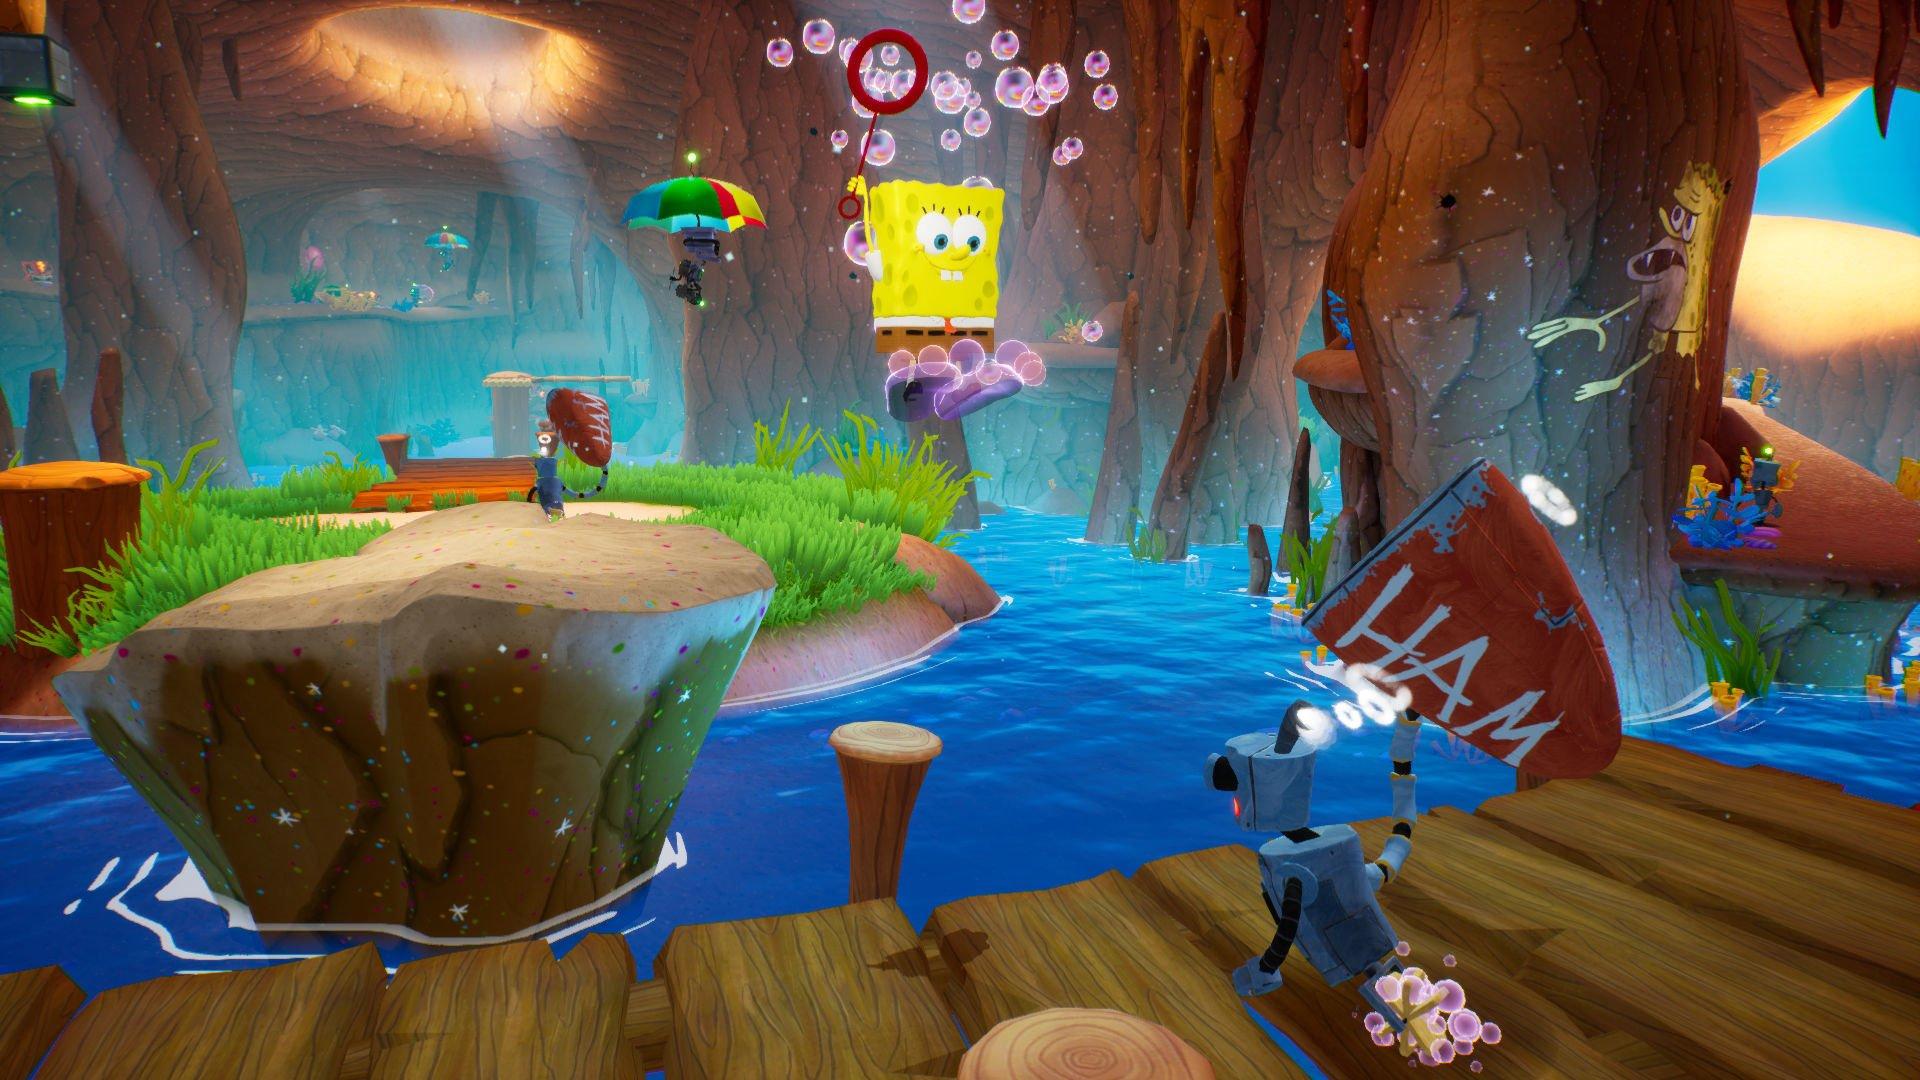 Screenshot for the game SpongeBob SquarePants: Battle for Bikini Bottom Rehydrated V. 1.03 [GOG] (2003-2020) download torrent License